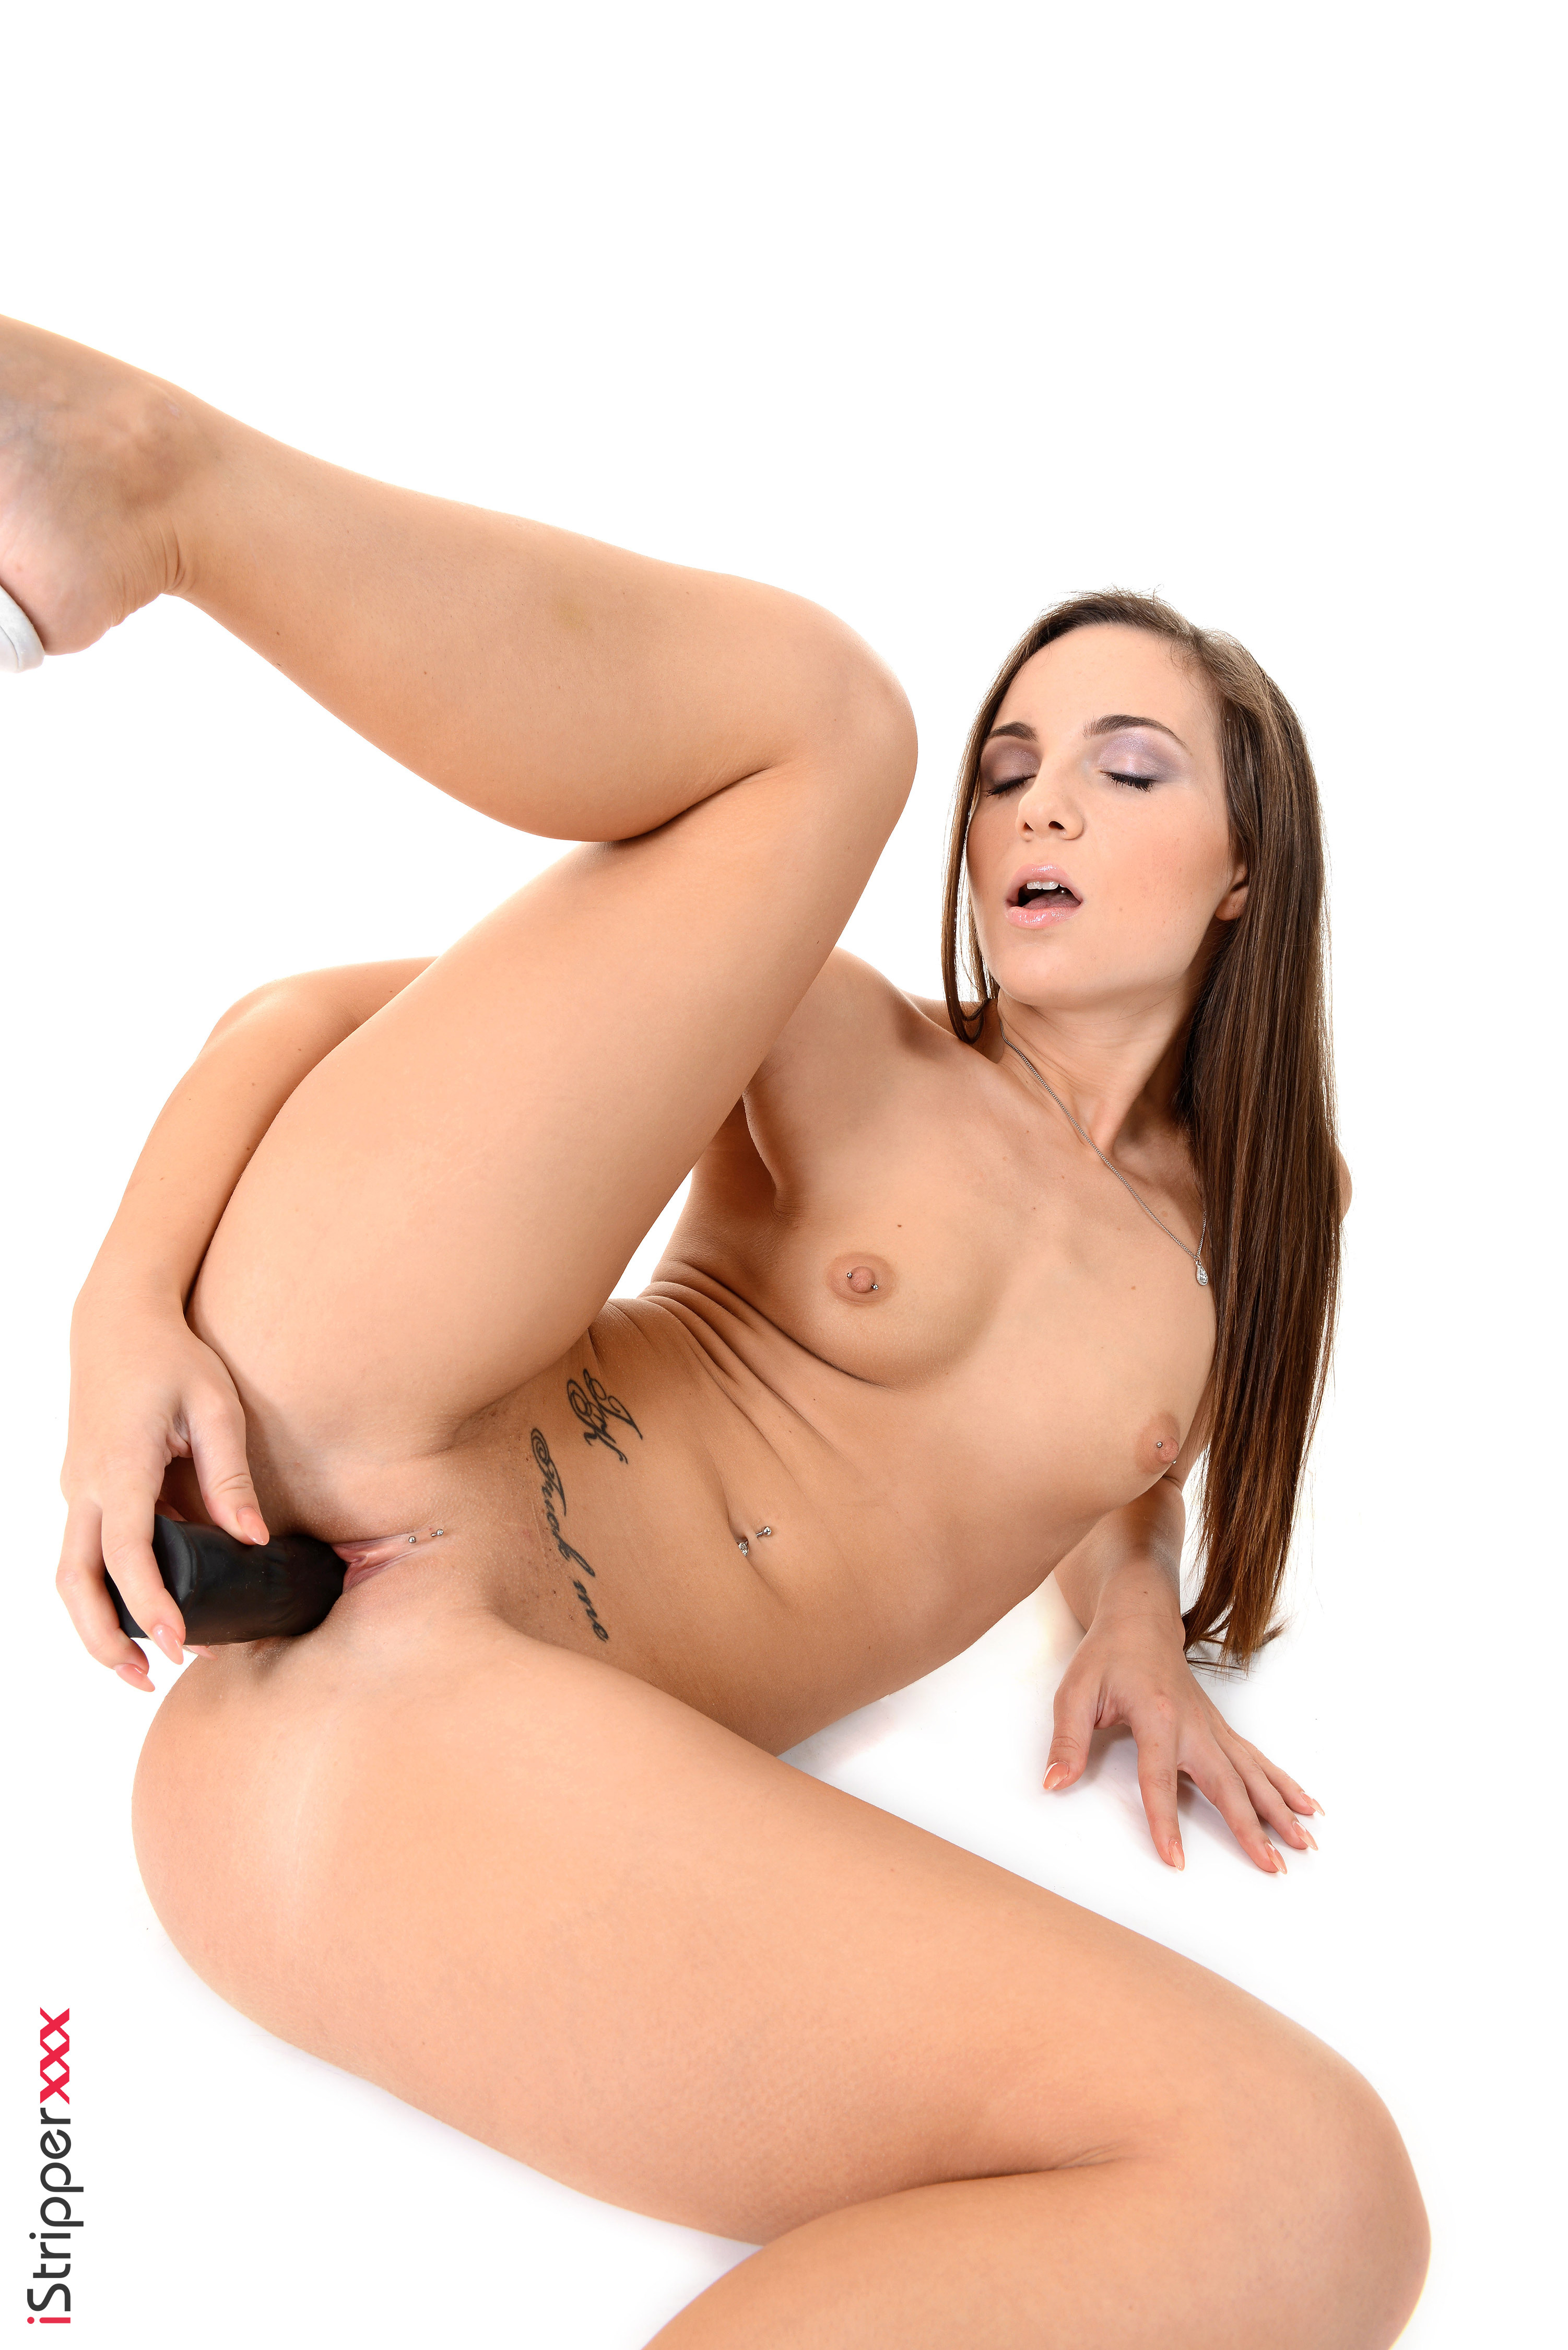 hot erotic wallpapers